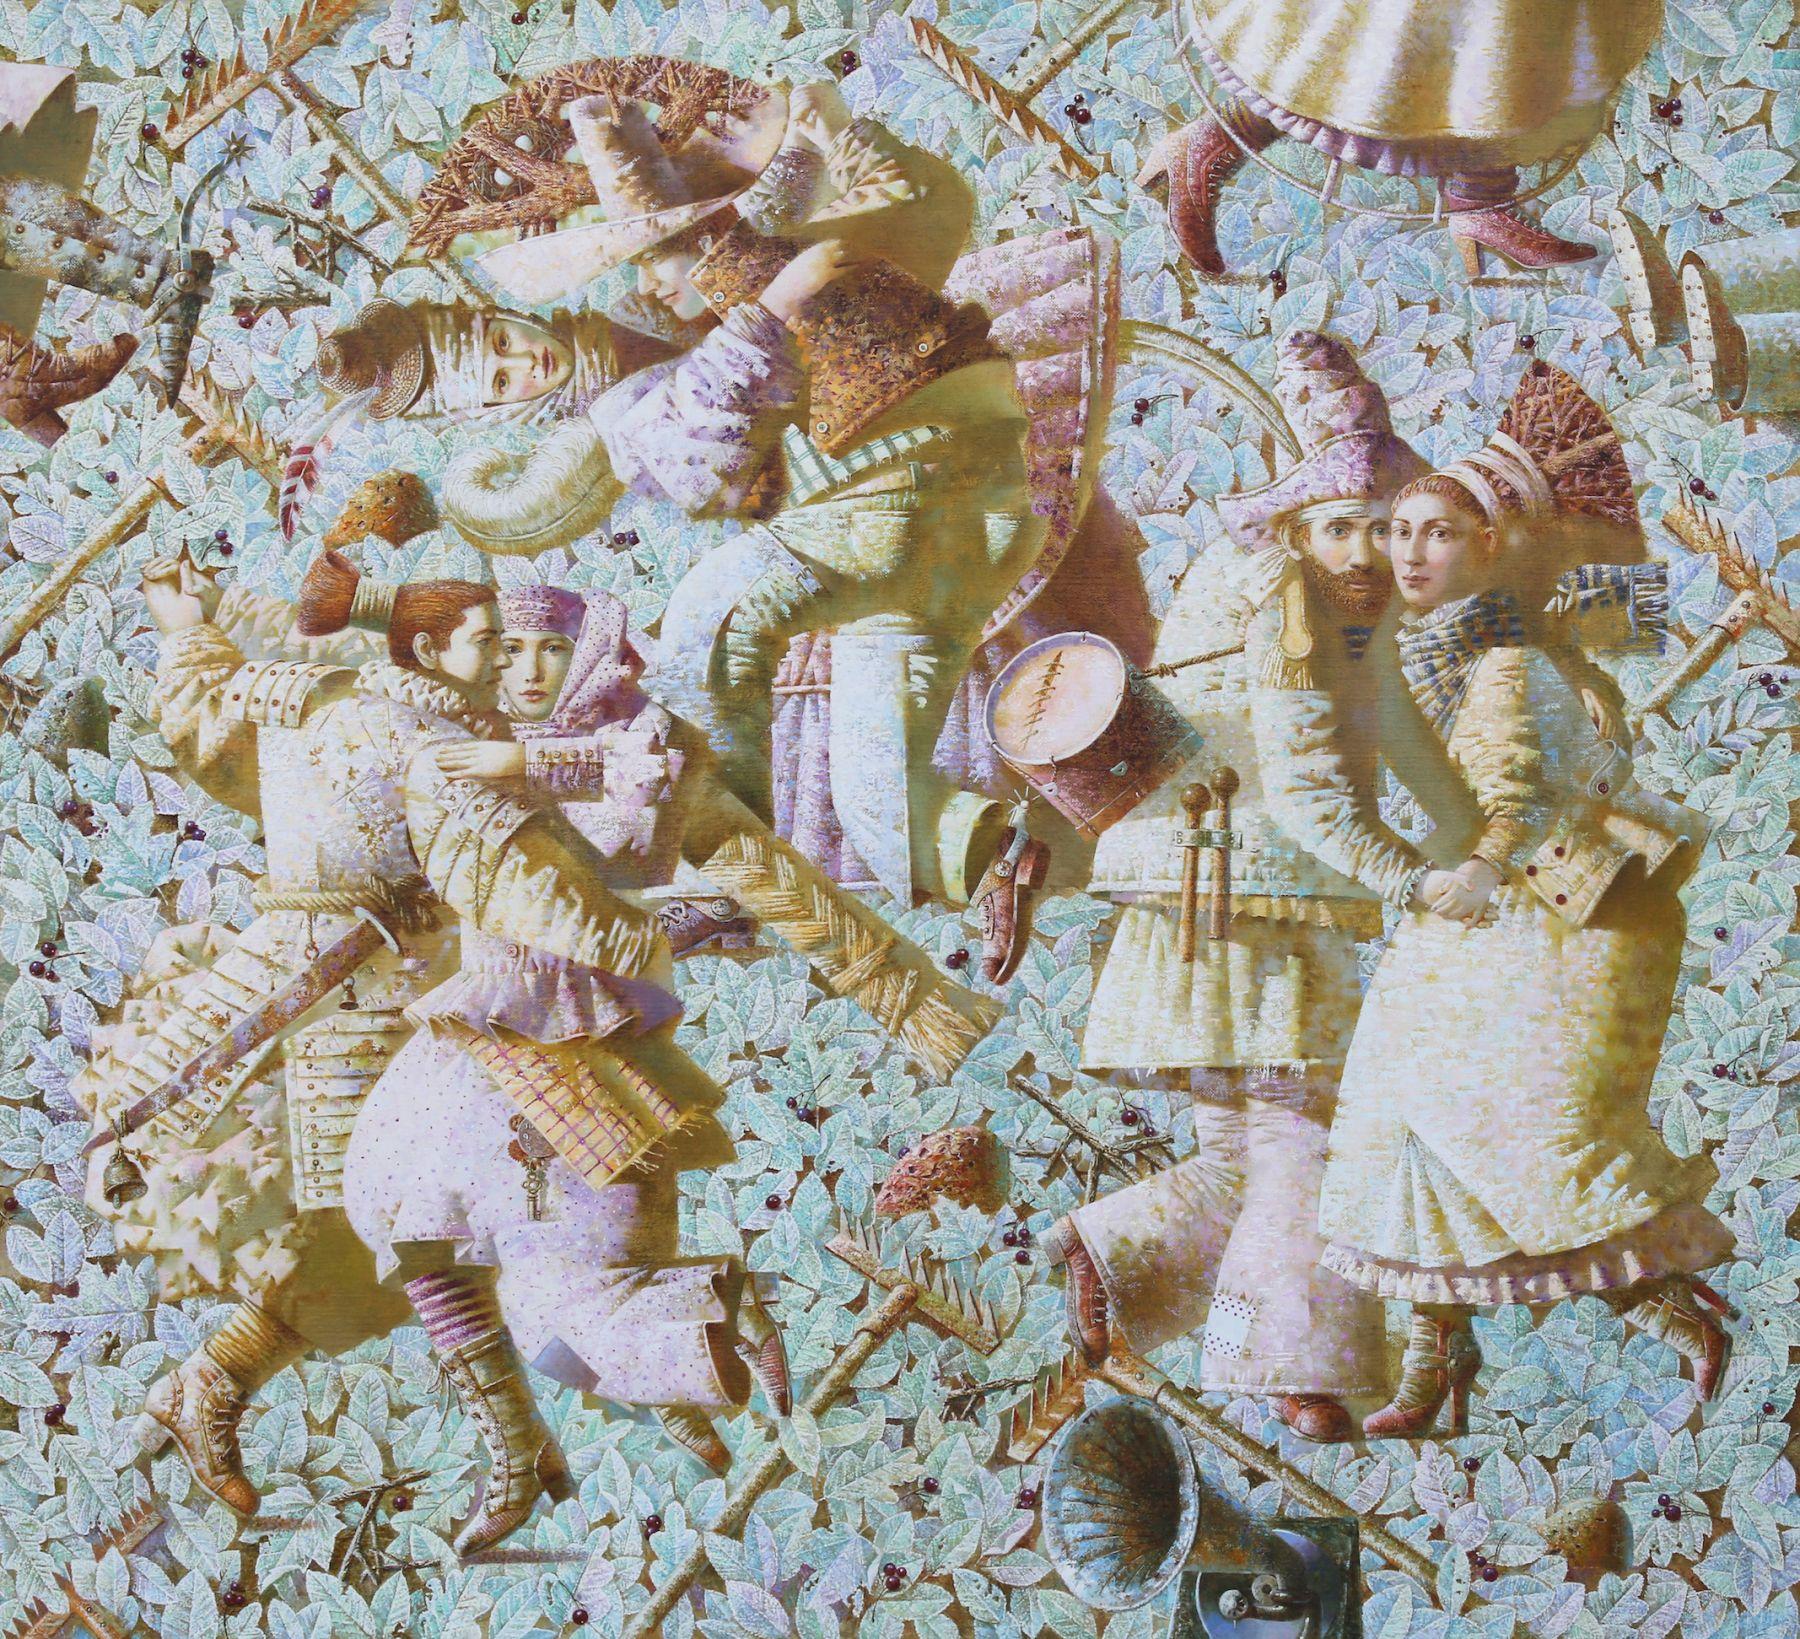 Anna Berezovskaya_Dancing on Rakes